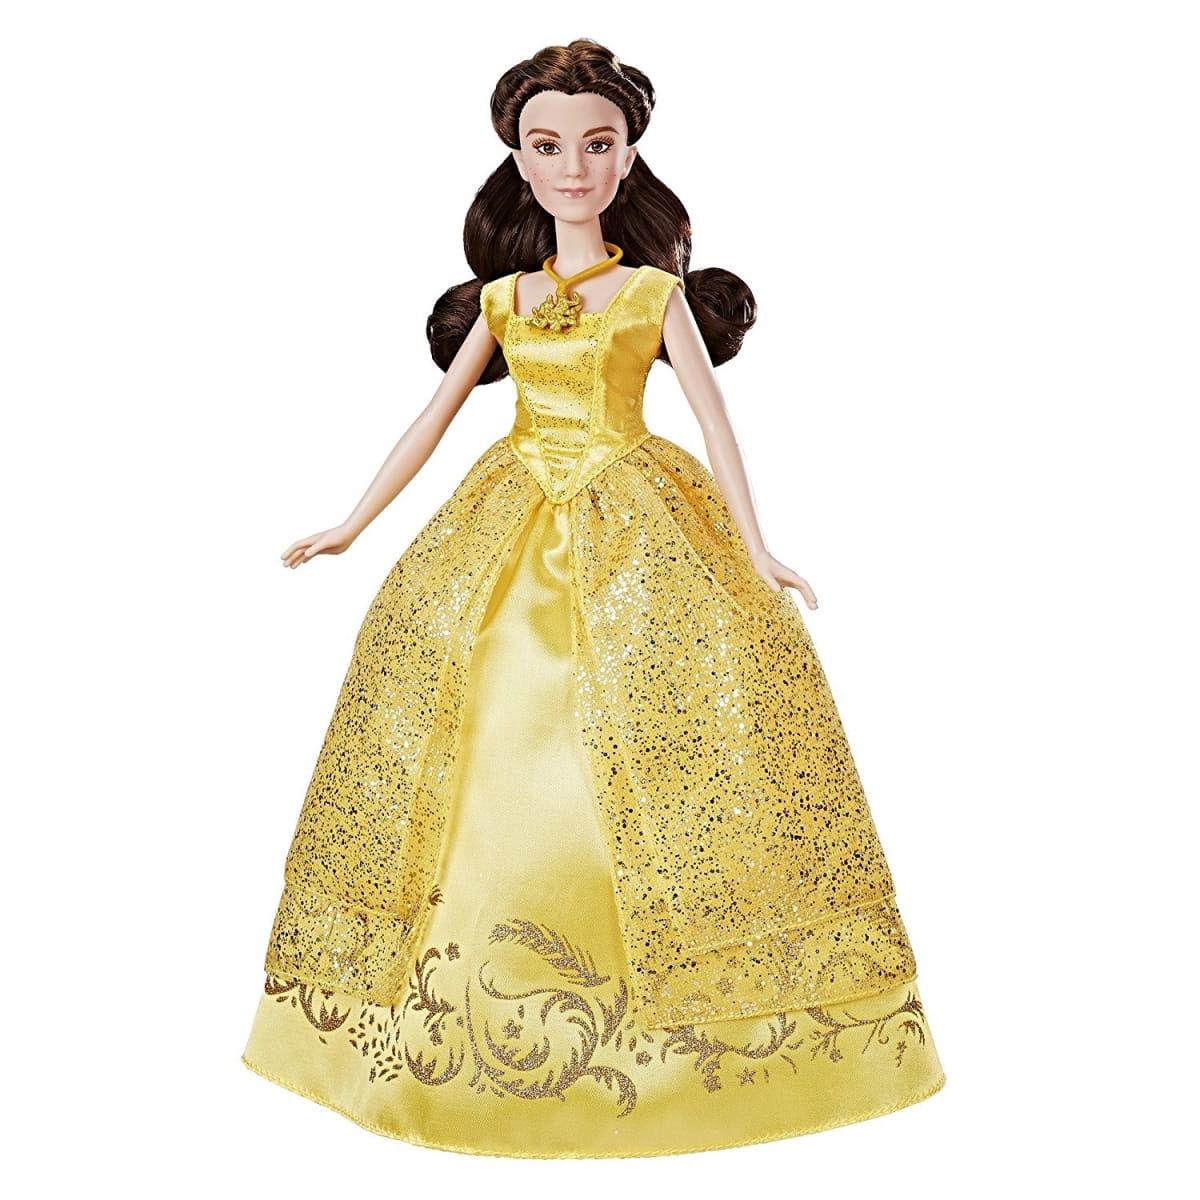 Кукла Disney Princess Поющая Белль (HASBRO)